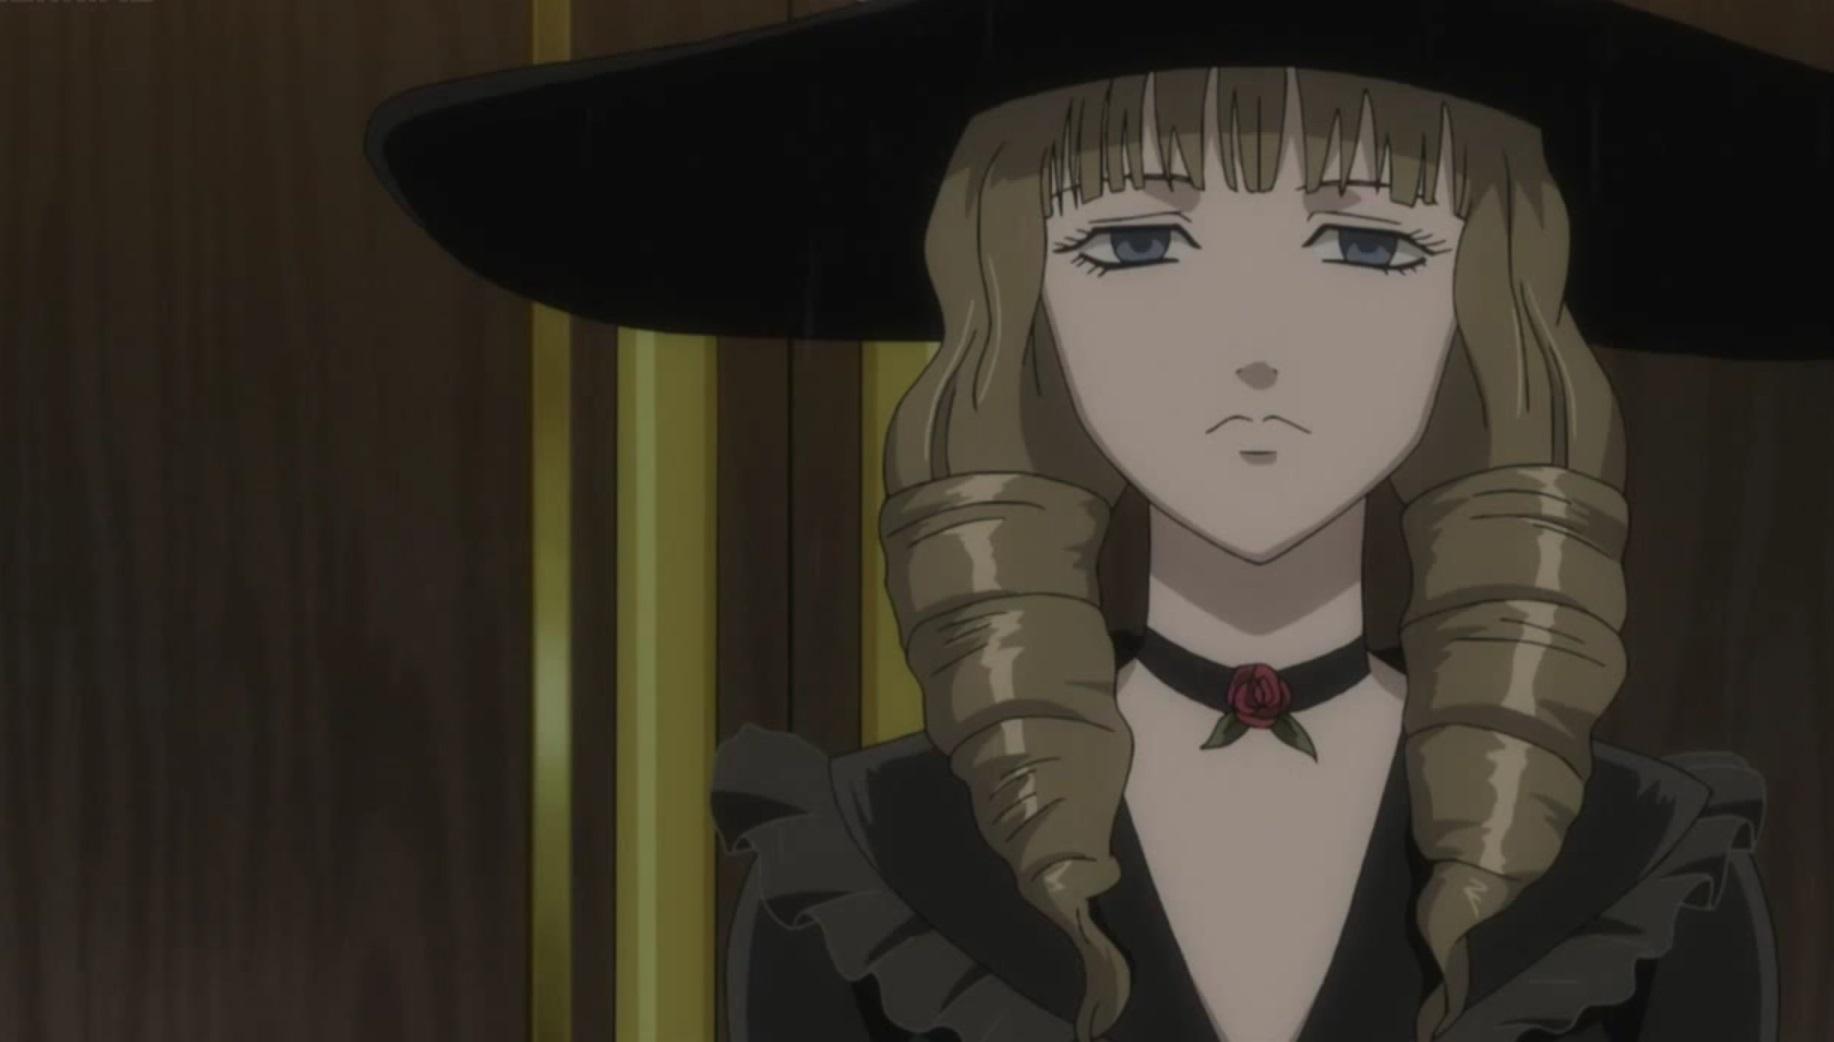 Madame Yagami